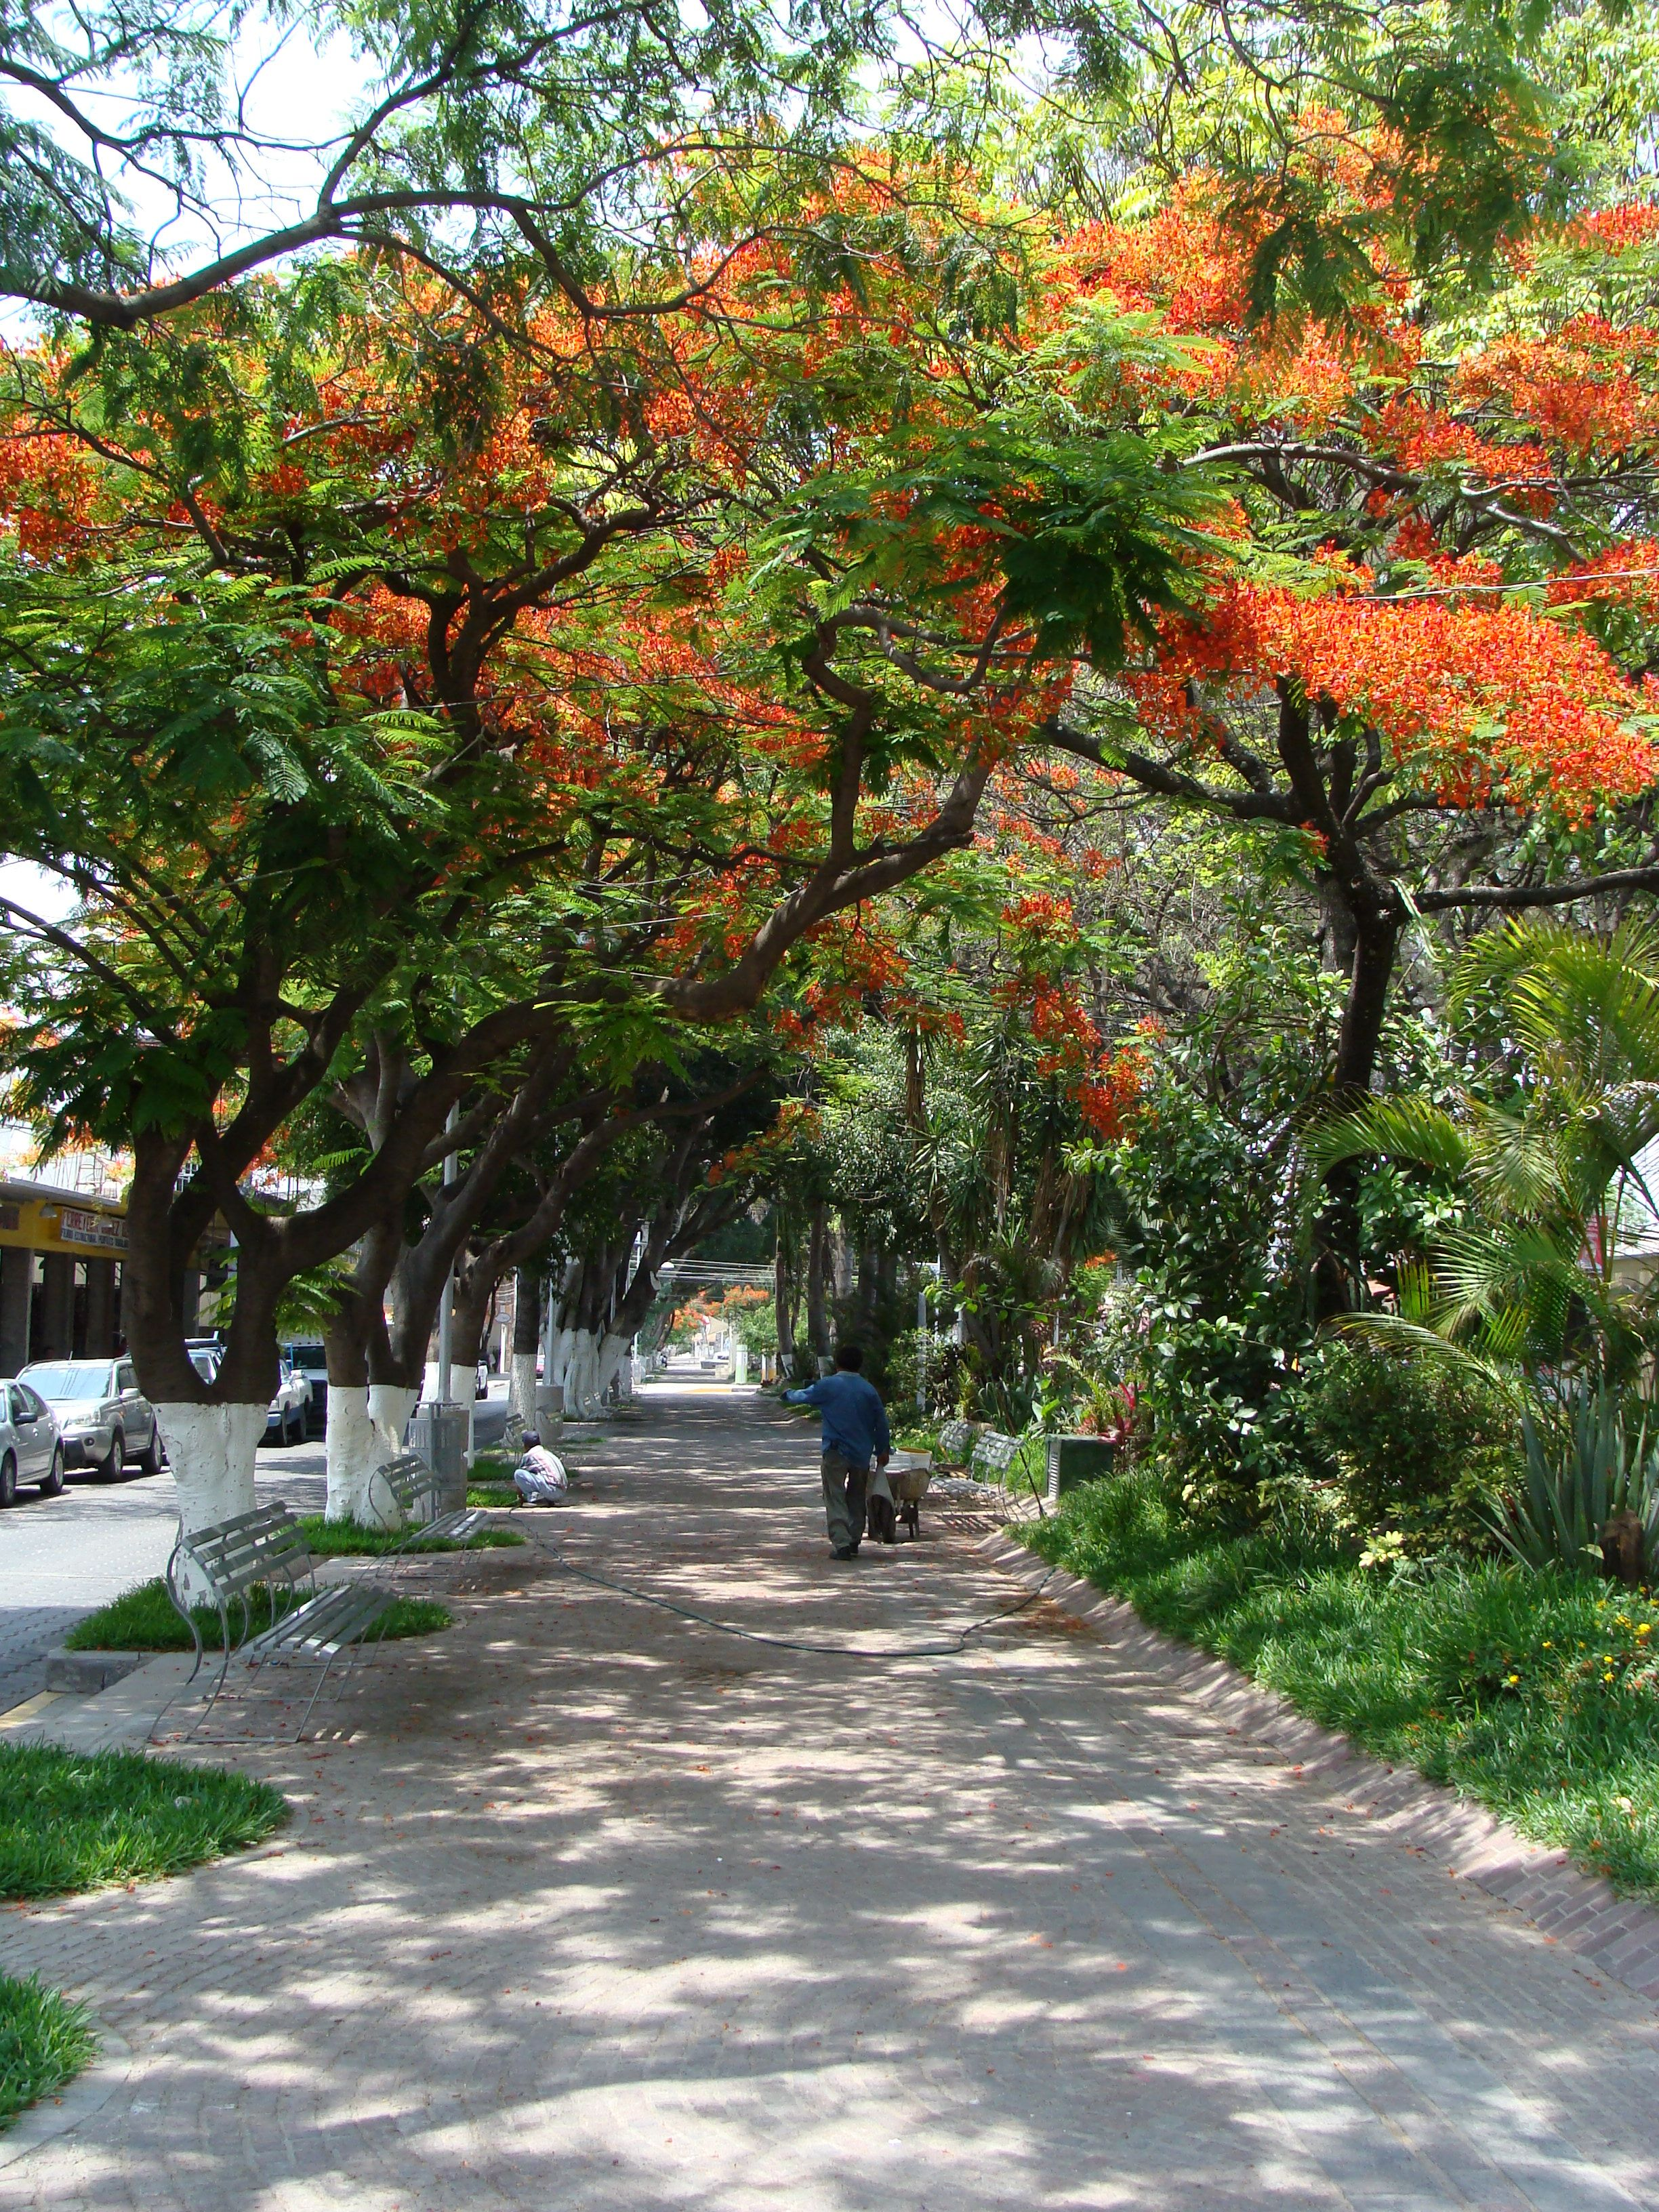 Framboyanes del Paseo Hidalgo, Tehuacán   Arboles   Pinterest   Paseos